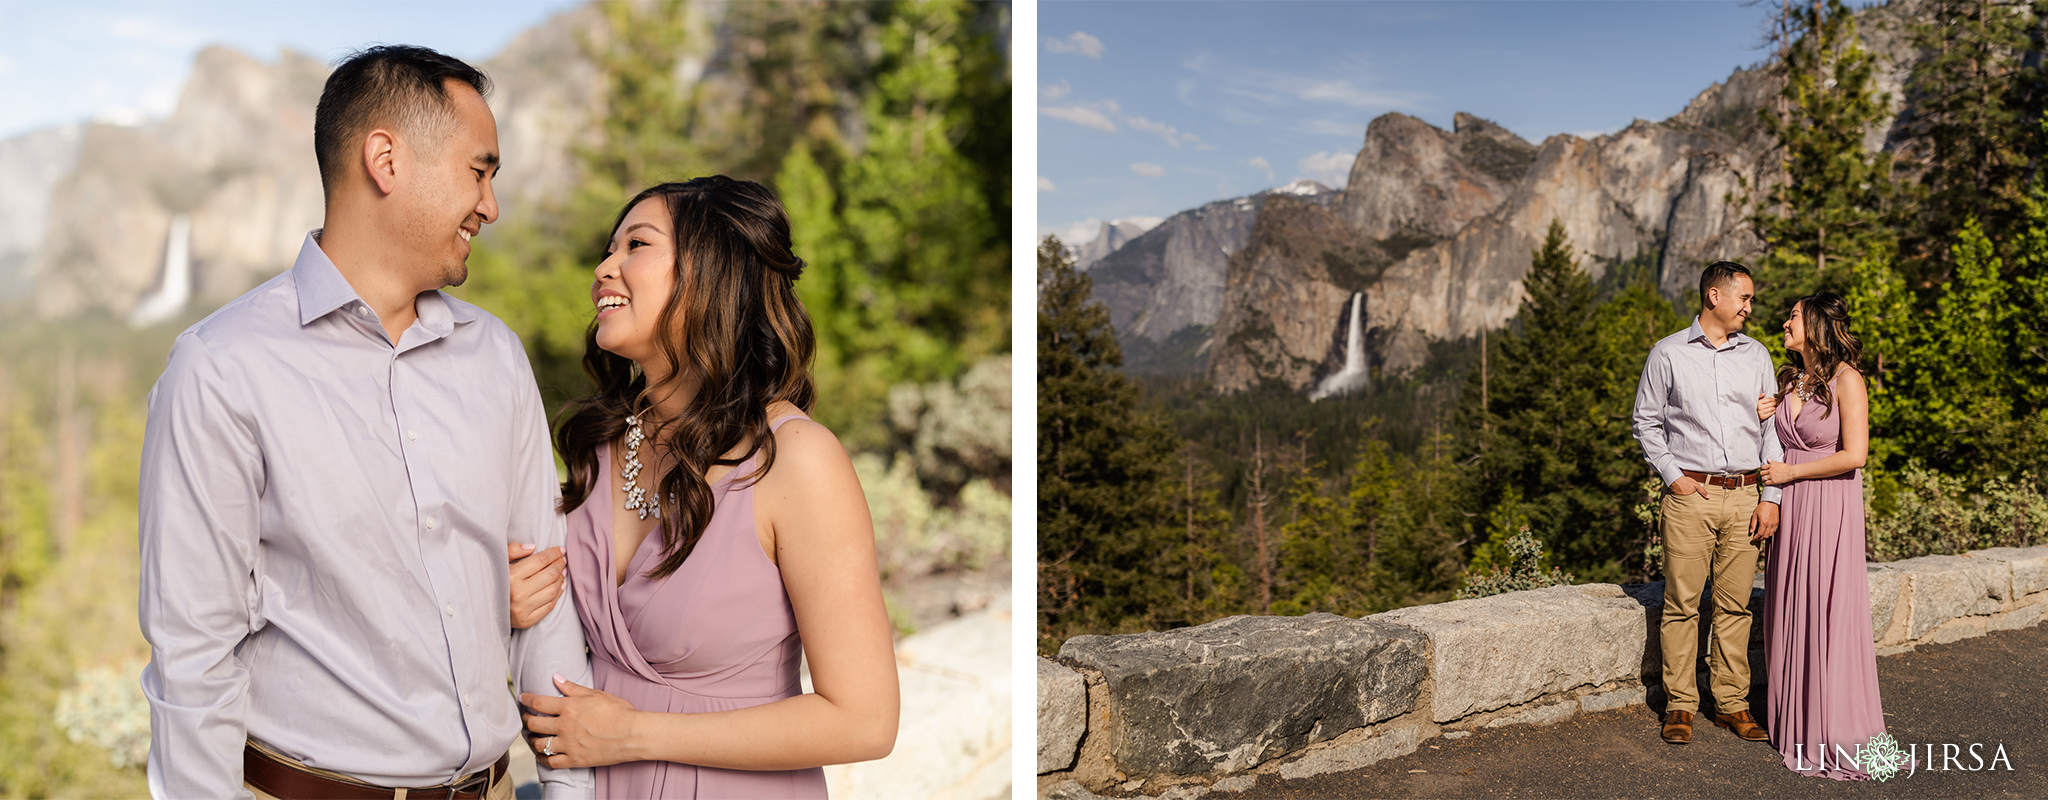 02 Yosemite National Park Travel Destination Engagement Photography